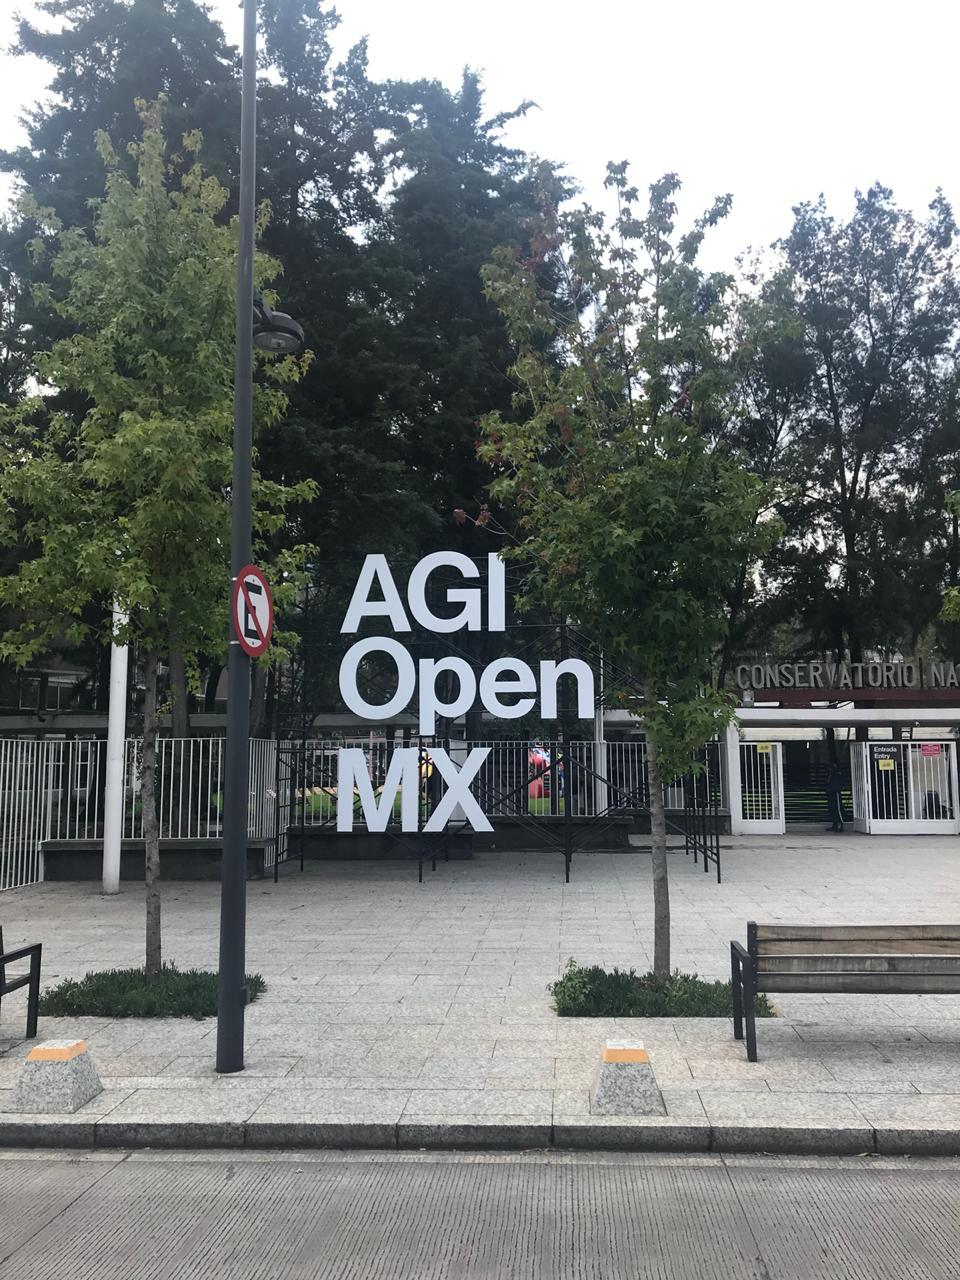 AGI Open MX